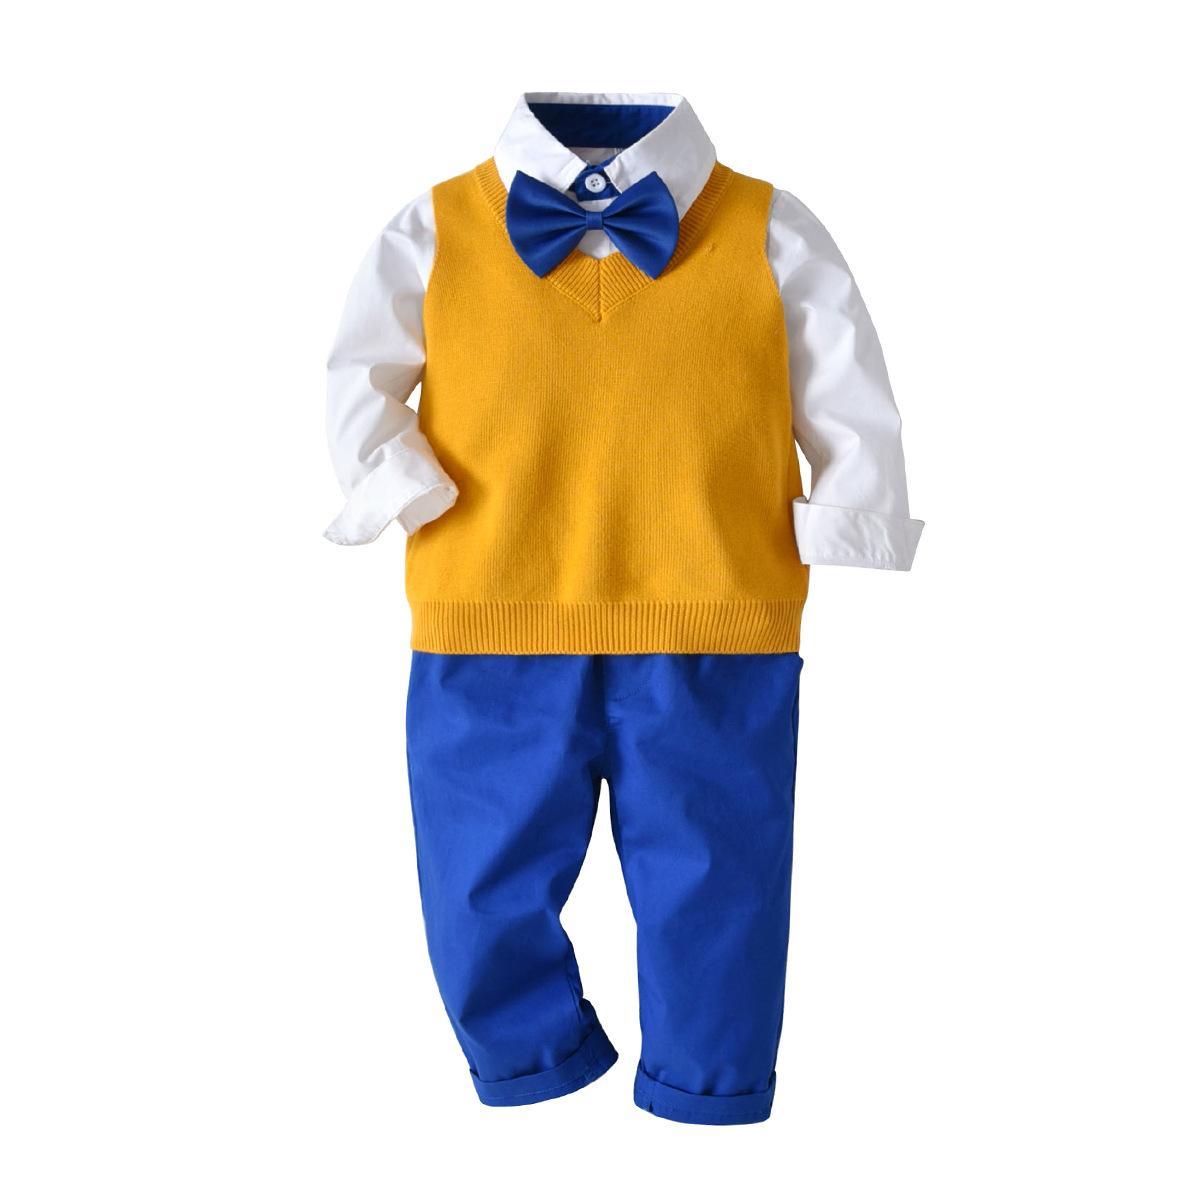 Junge Kleidung Set Autumn Gentleman Anzug Kinder Langarm-Fliege Plaid Shirt + Pants + Strickweste Kinder Outfits